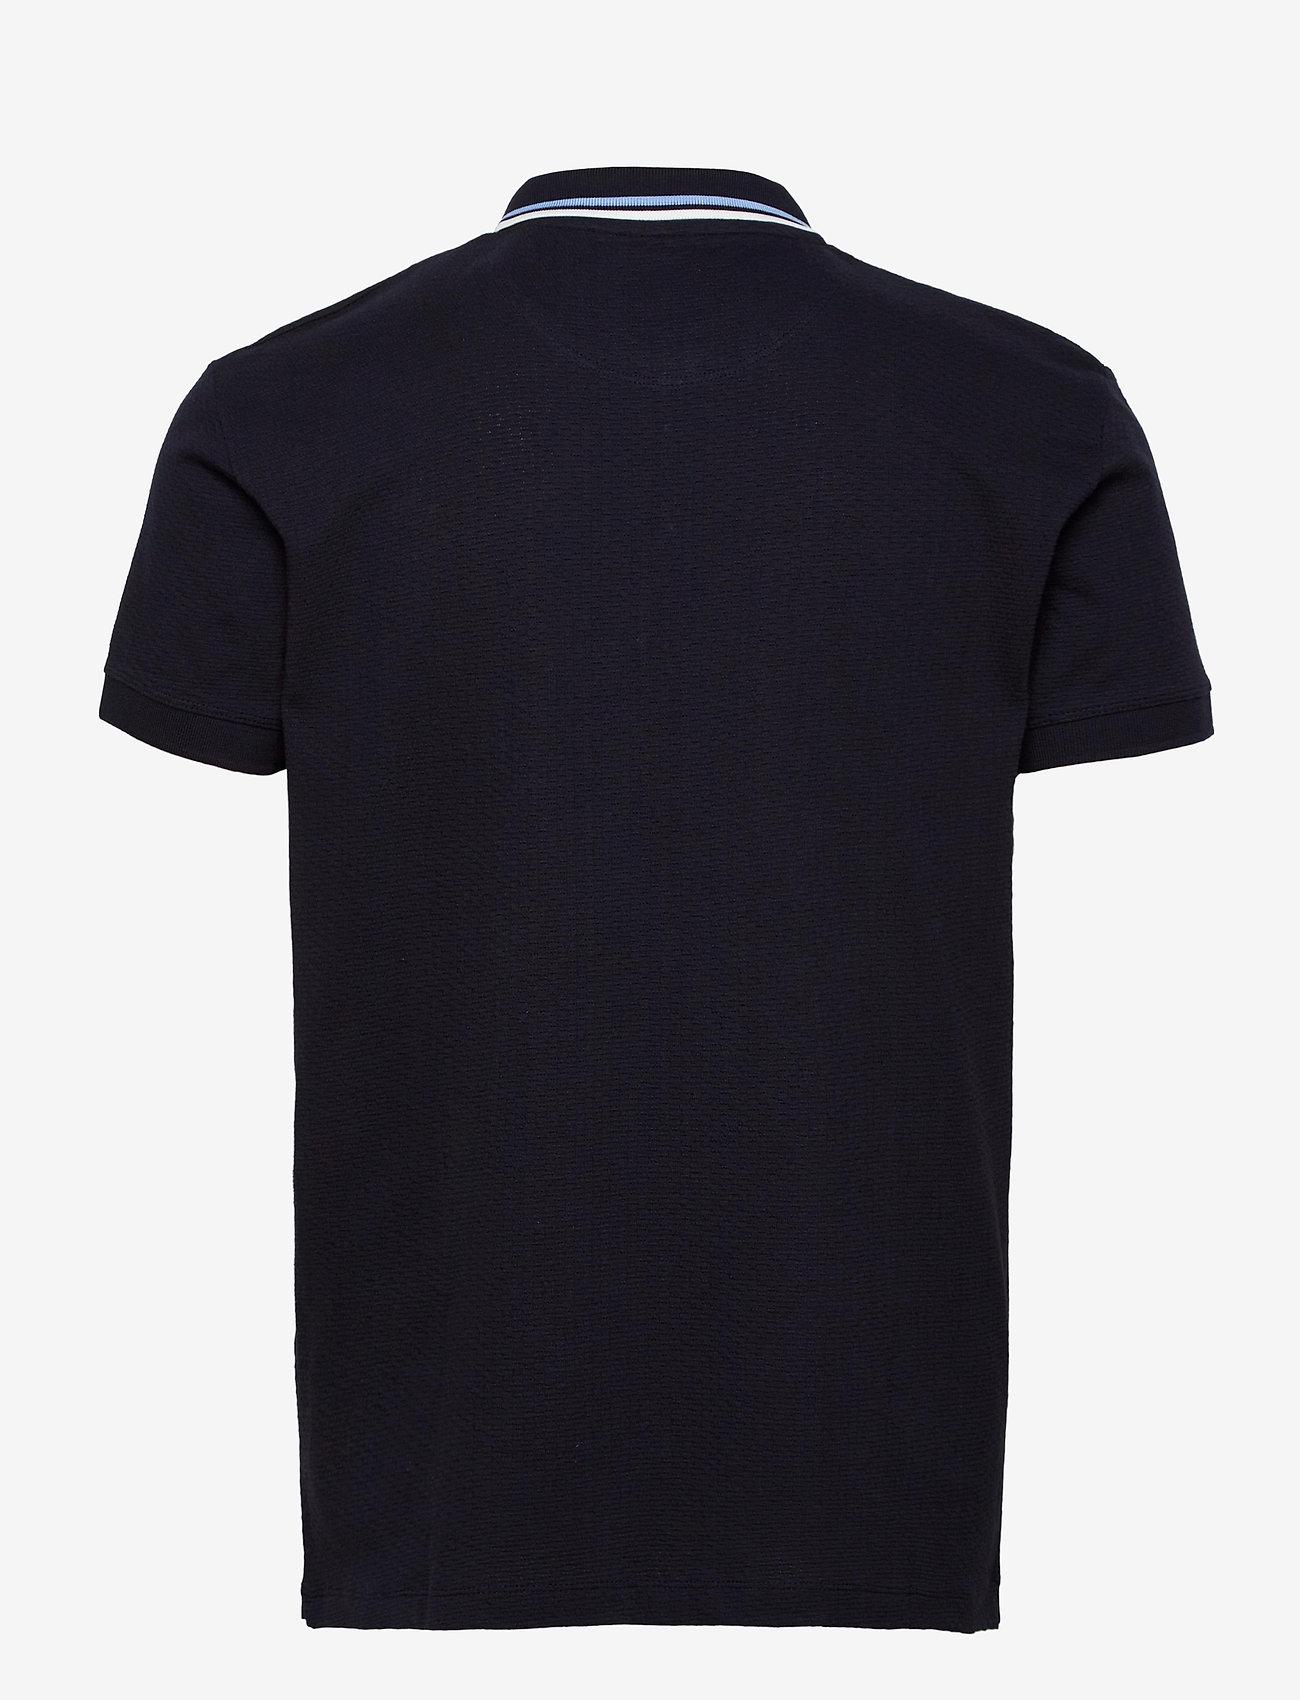 Esprit Casual - Polo shirts - t-shirts basiques - navy - 1